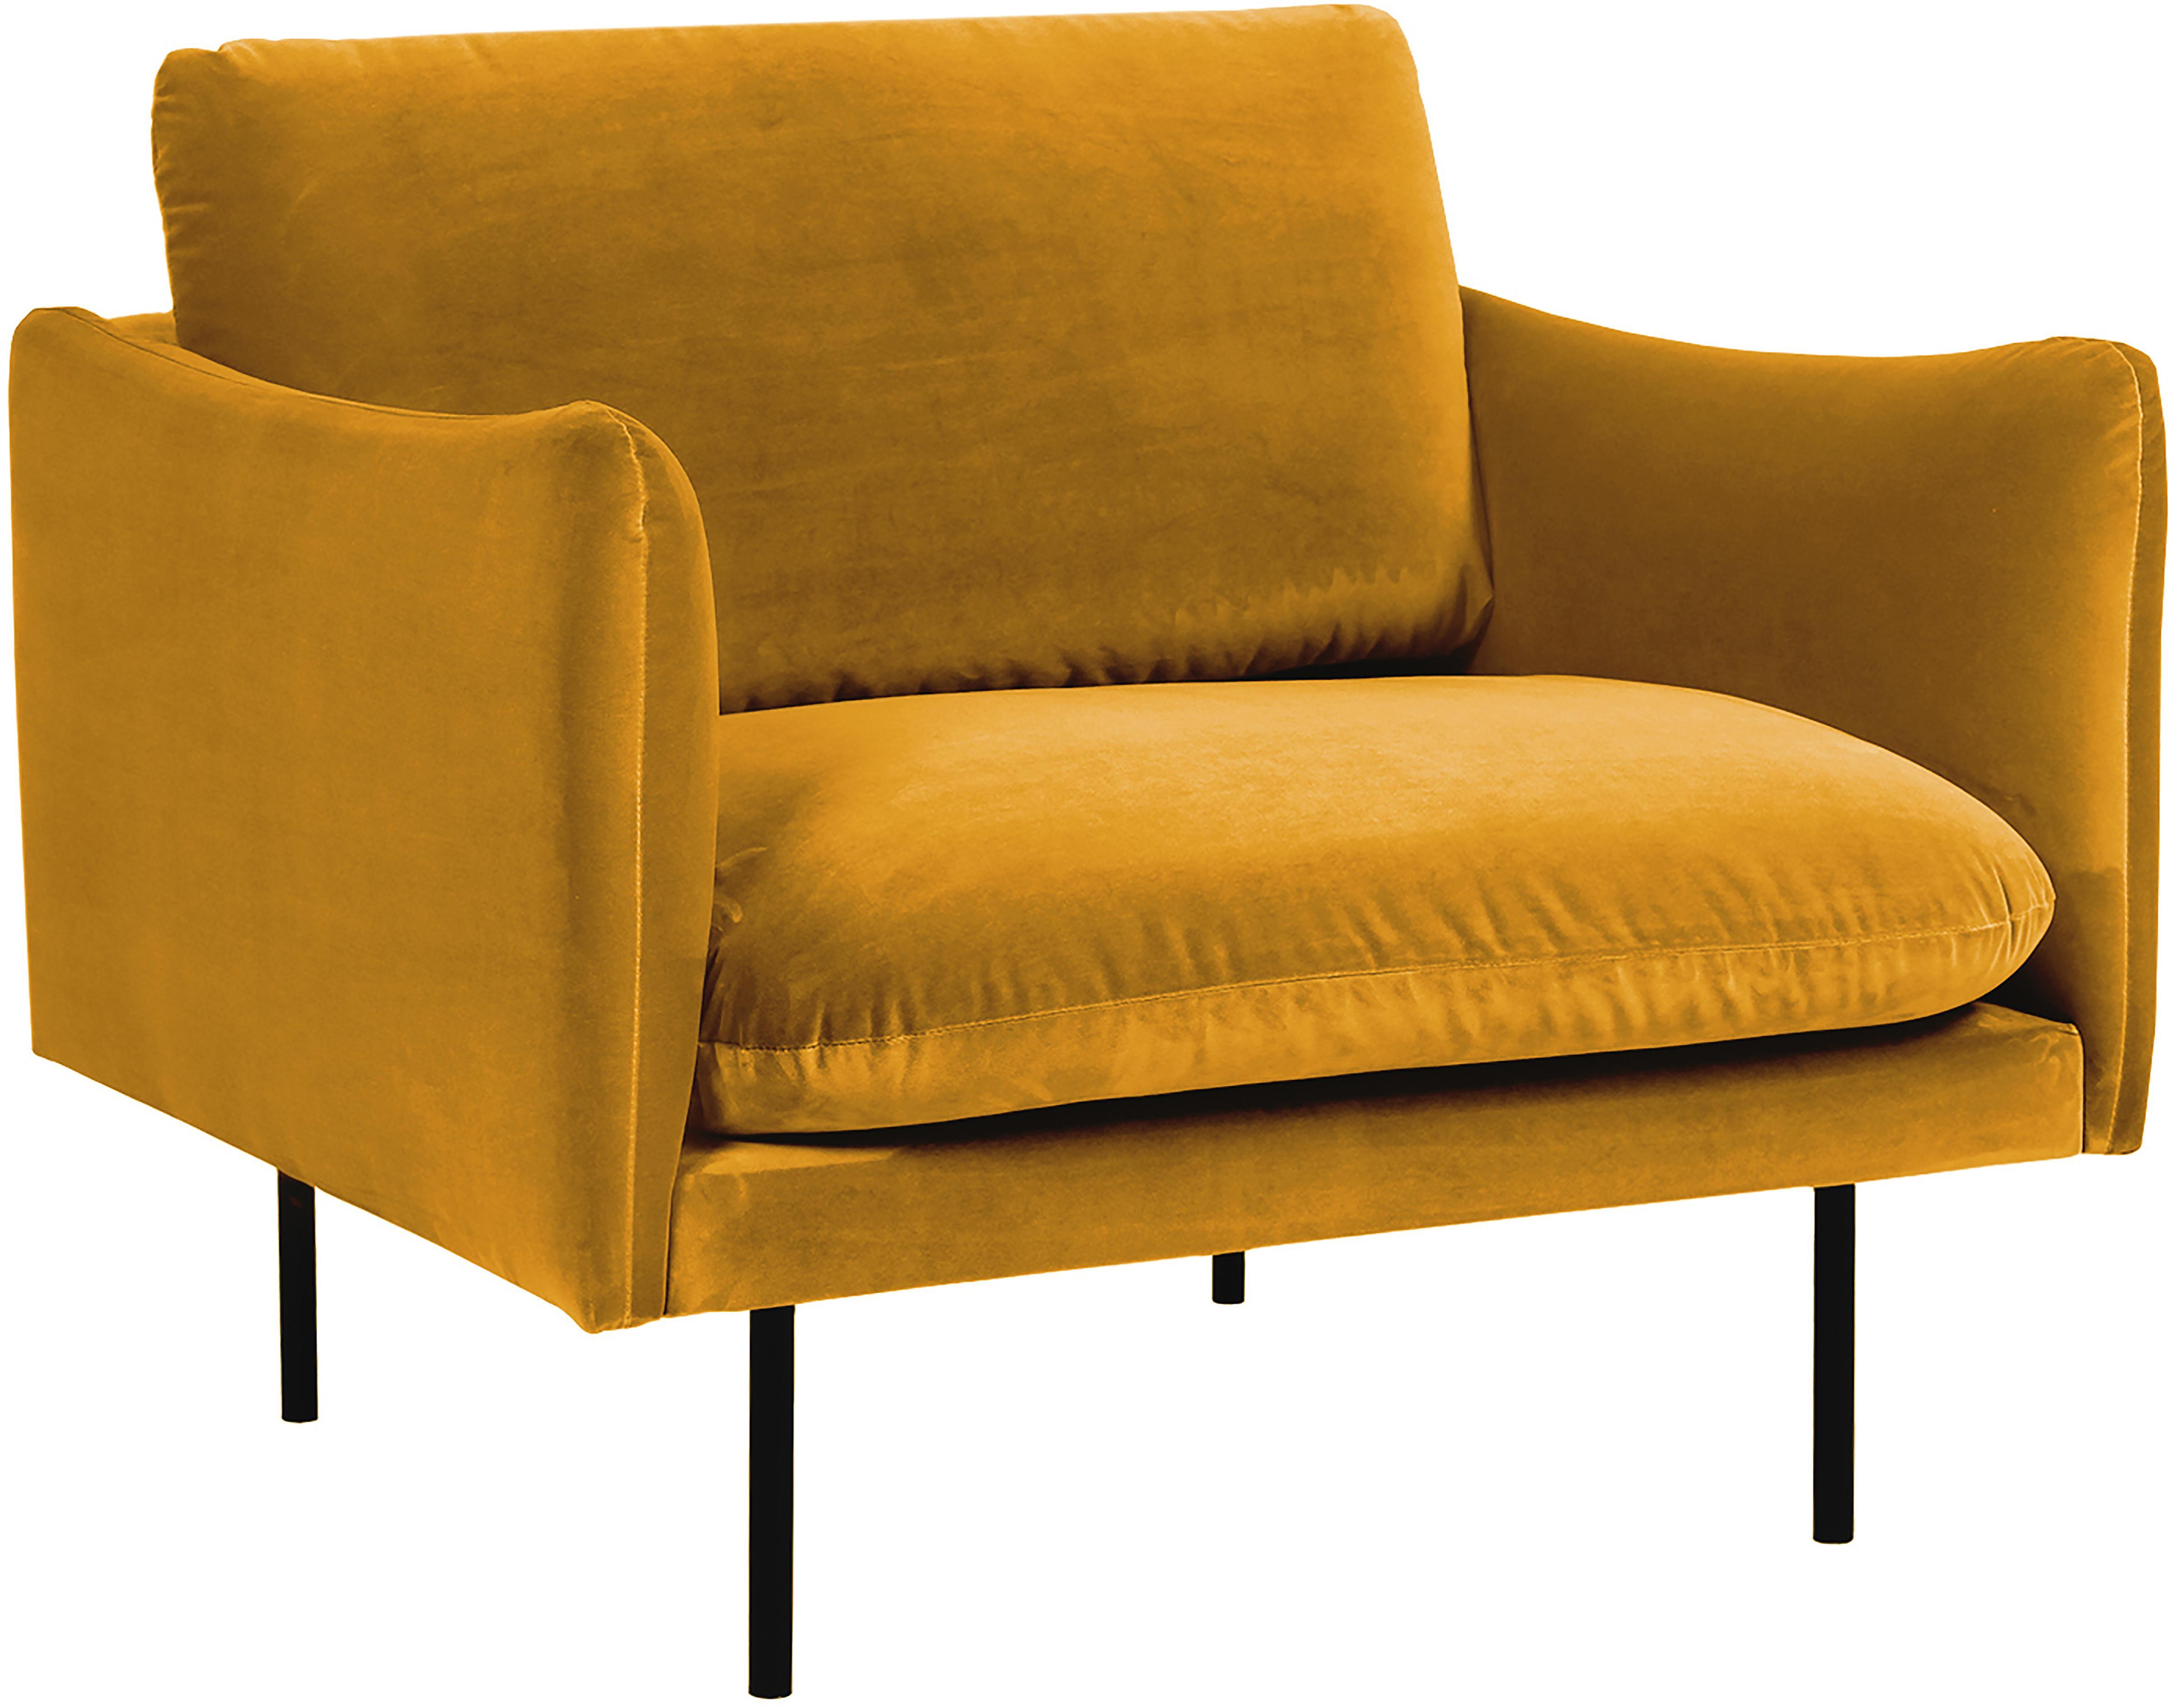 Samt-Sessel Moby, Bezug: Samt (Hochwertiger Polyes, Gestell: Massives Kiefernholz, Füße: Metall, pulverbeschichtet, Samt Senfgelb, B 90 x T 90 cm